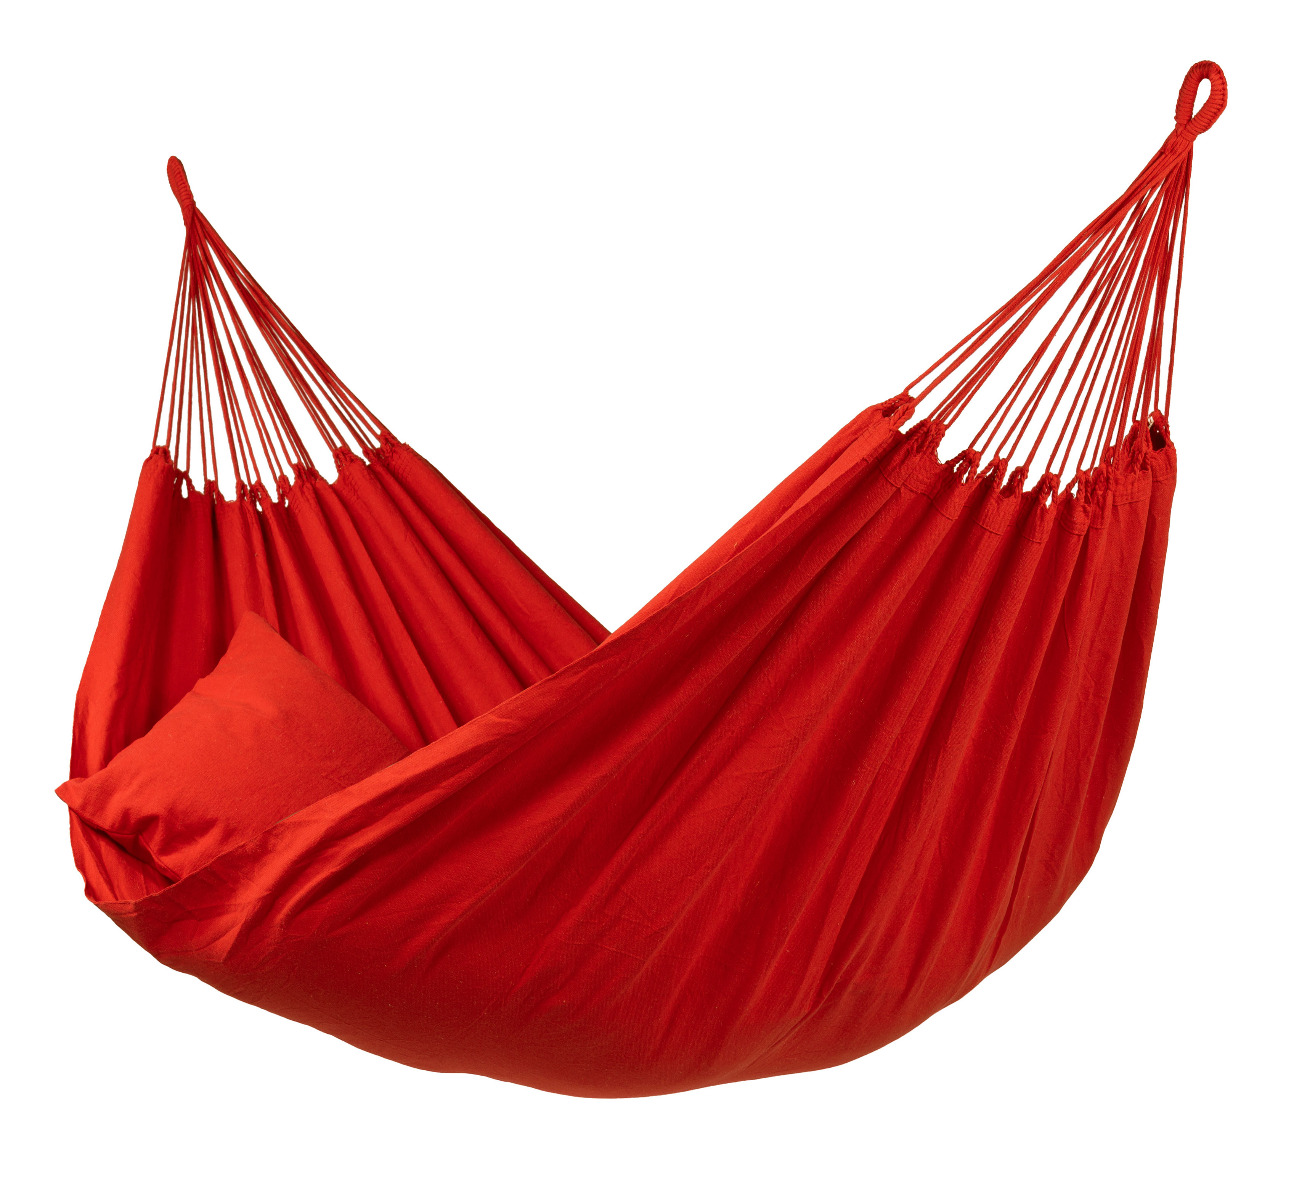 'Plain' Red E�npersoons Hangmat - Rood - Tropilex �